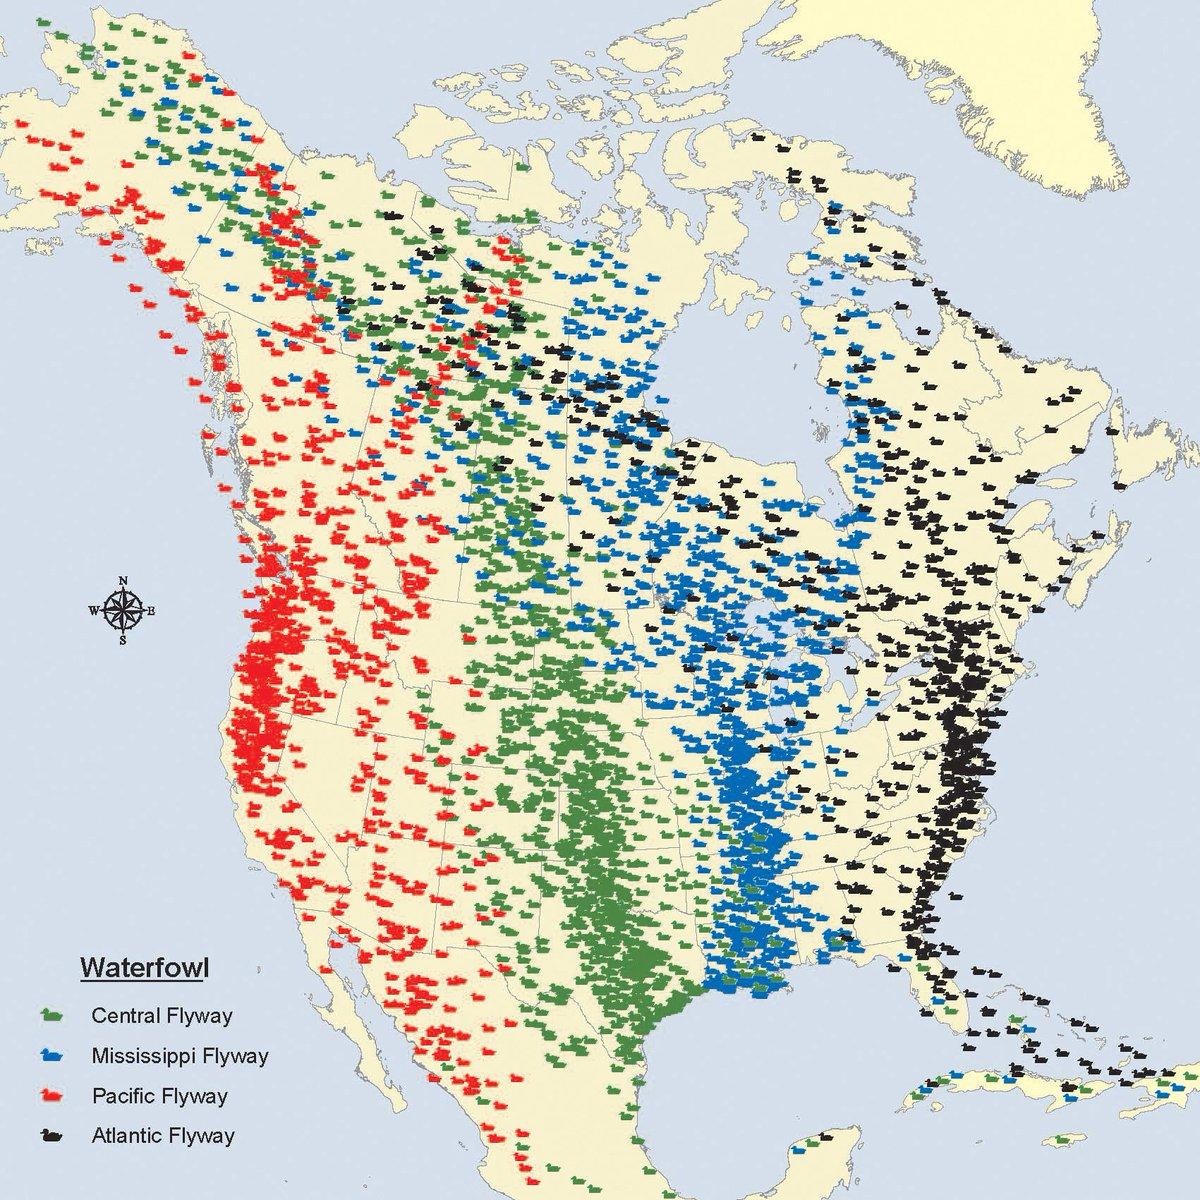 Four migratory bird flyways—what a concept https://t.co/1K53j52ANO #birdyear https://t.co/L9oX1sGJwz